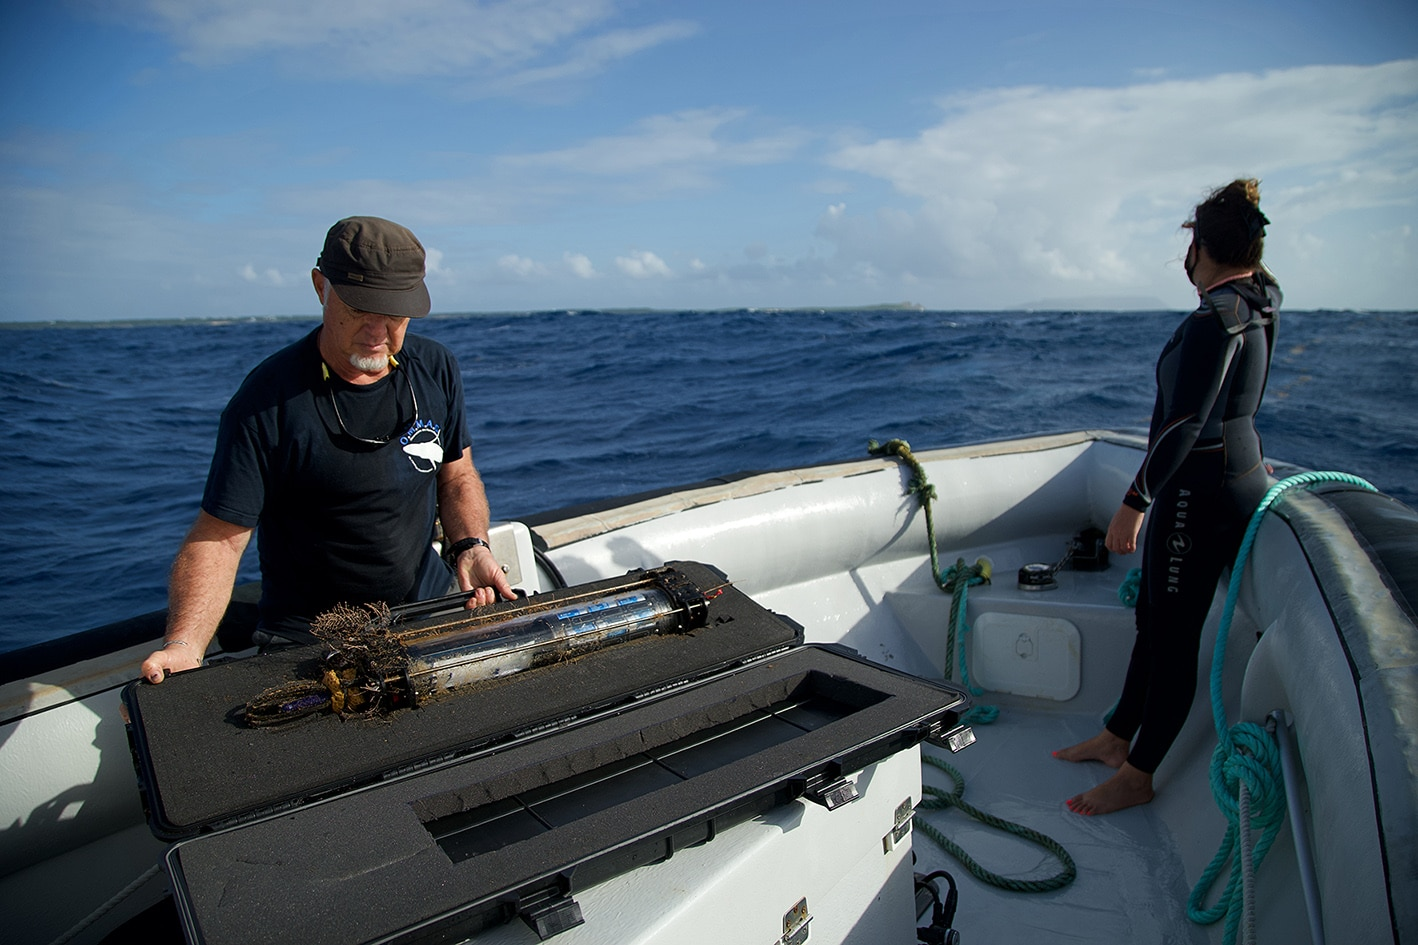 carimam mammiferes marins sur ecoute-ocean-balein